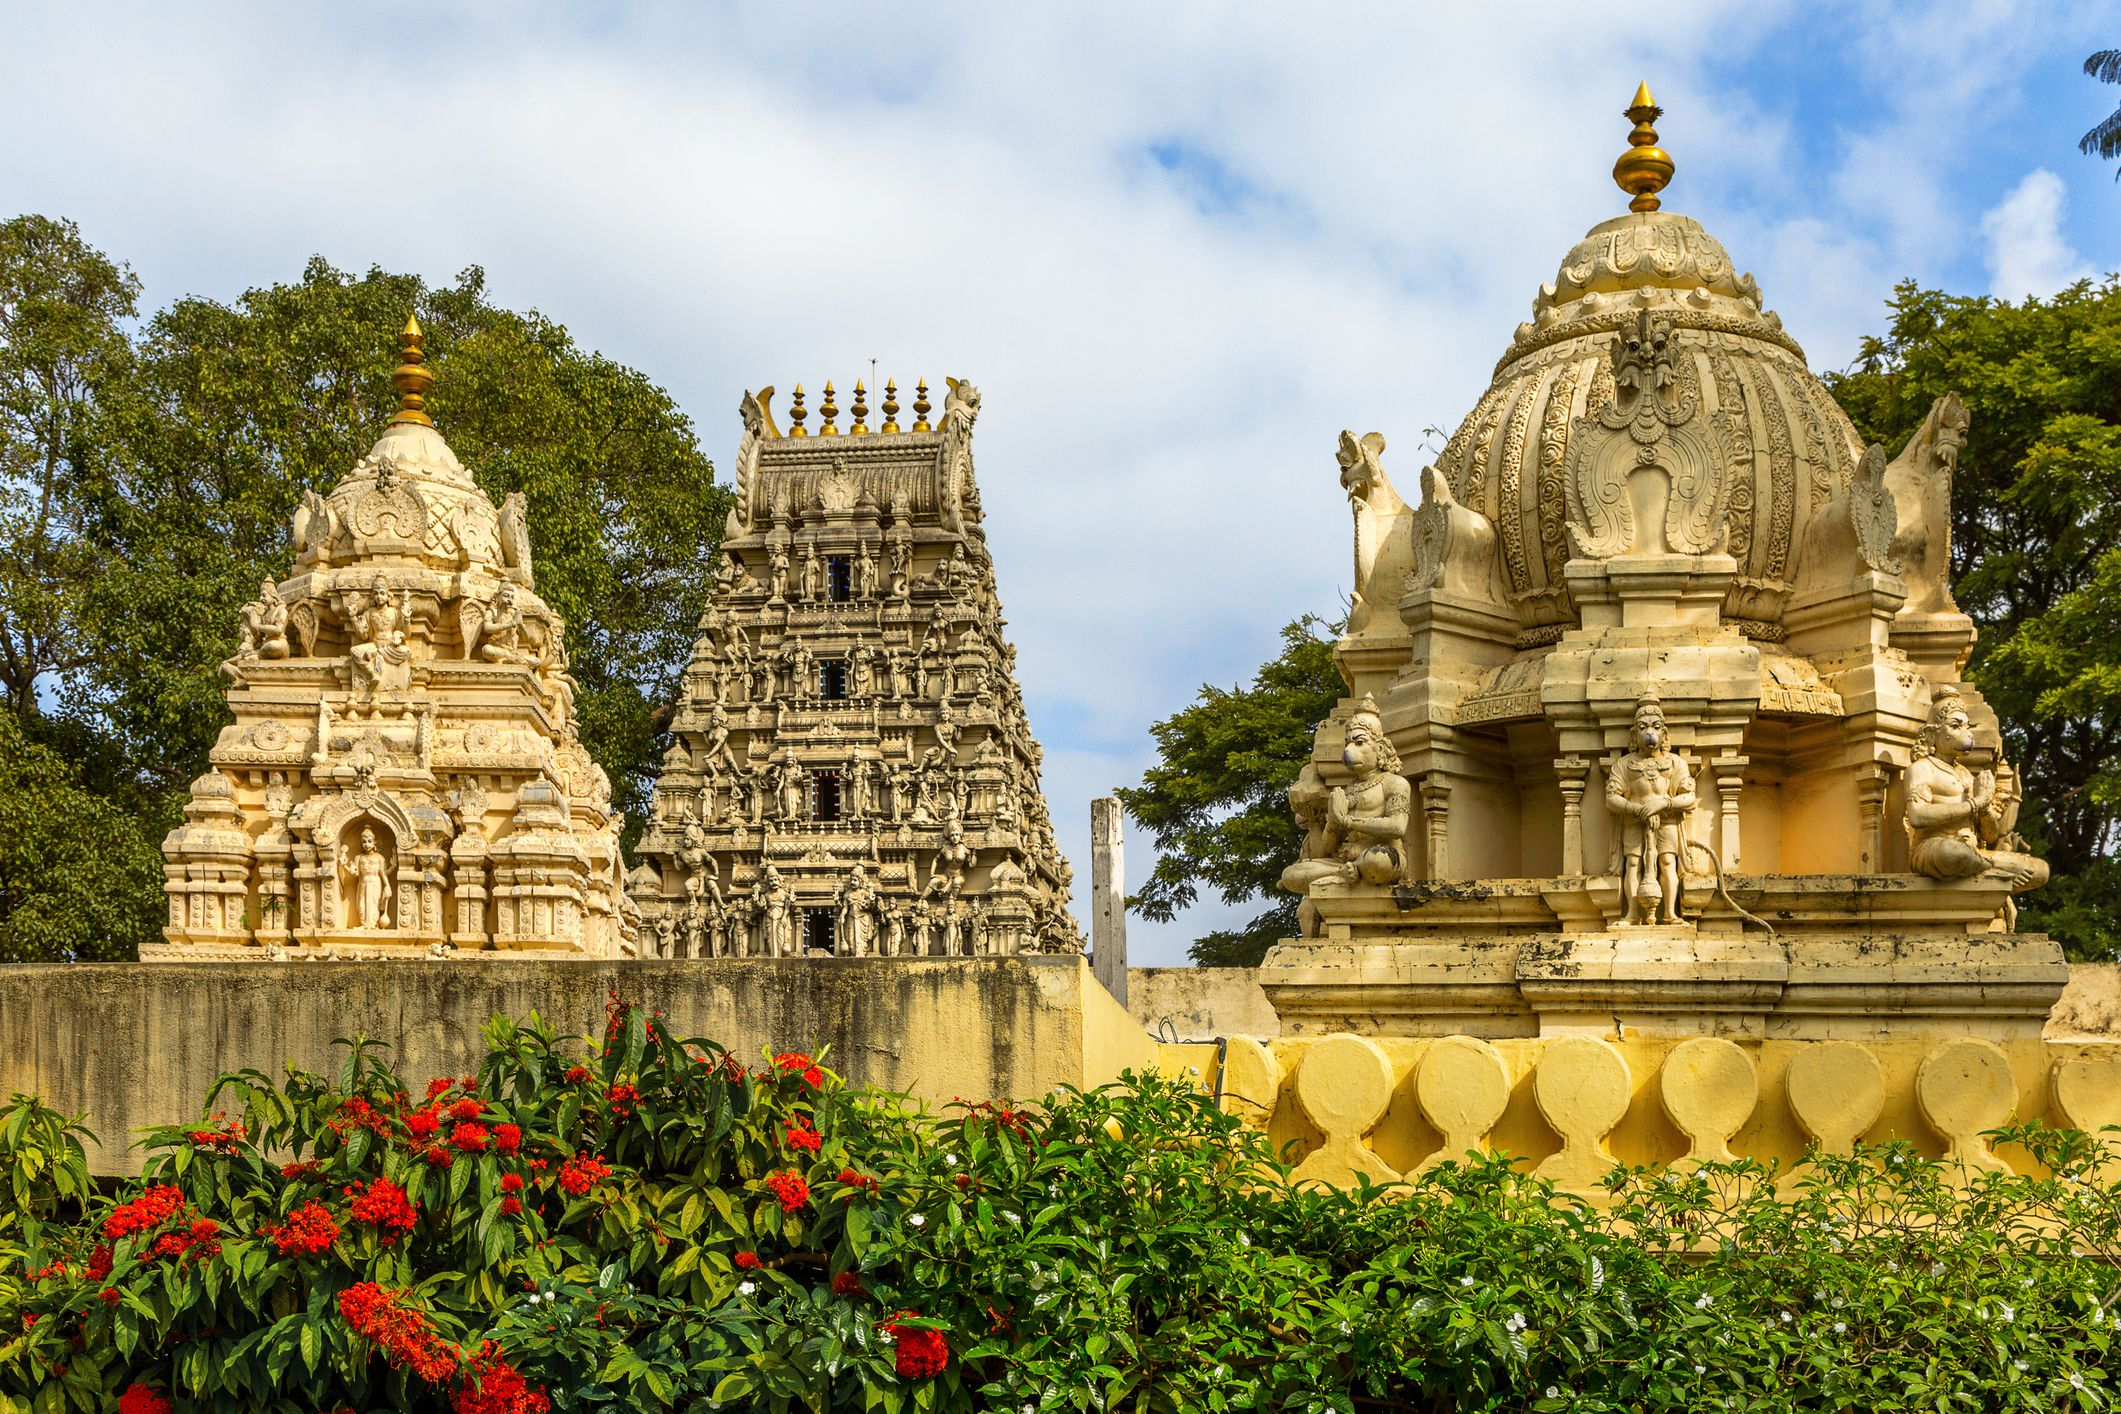 Kote Venkataramana Temple in Bangalore